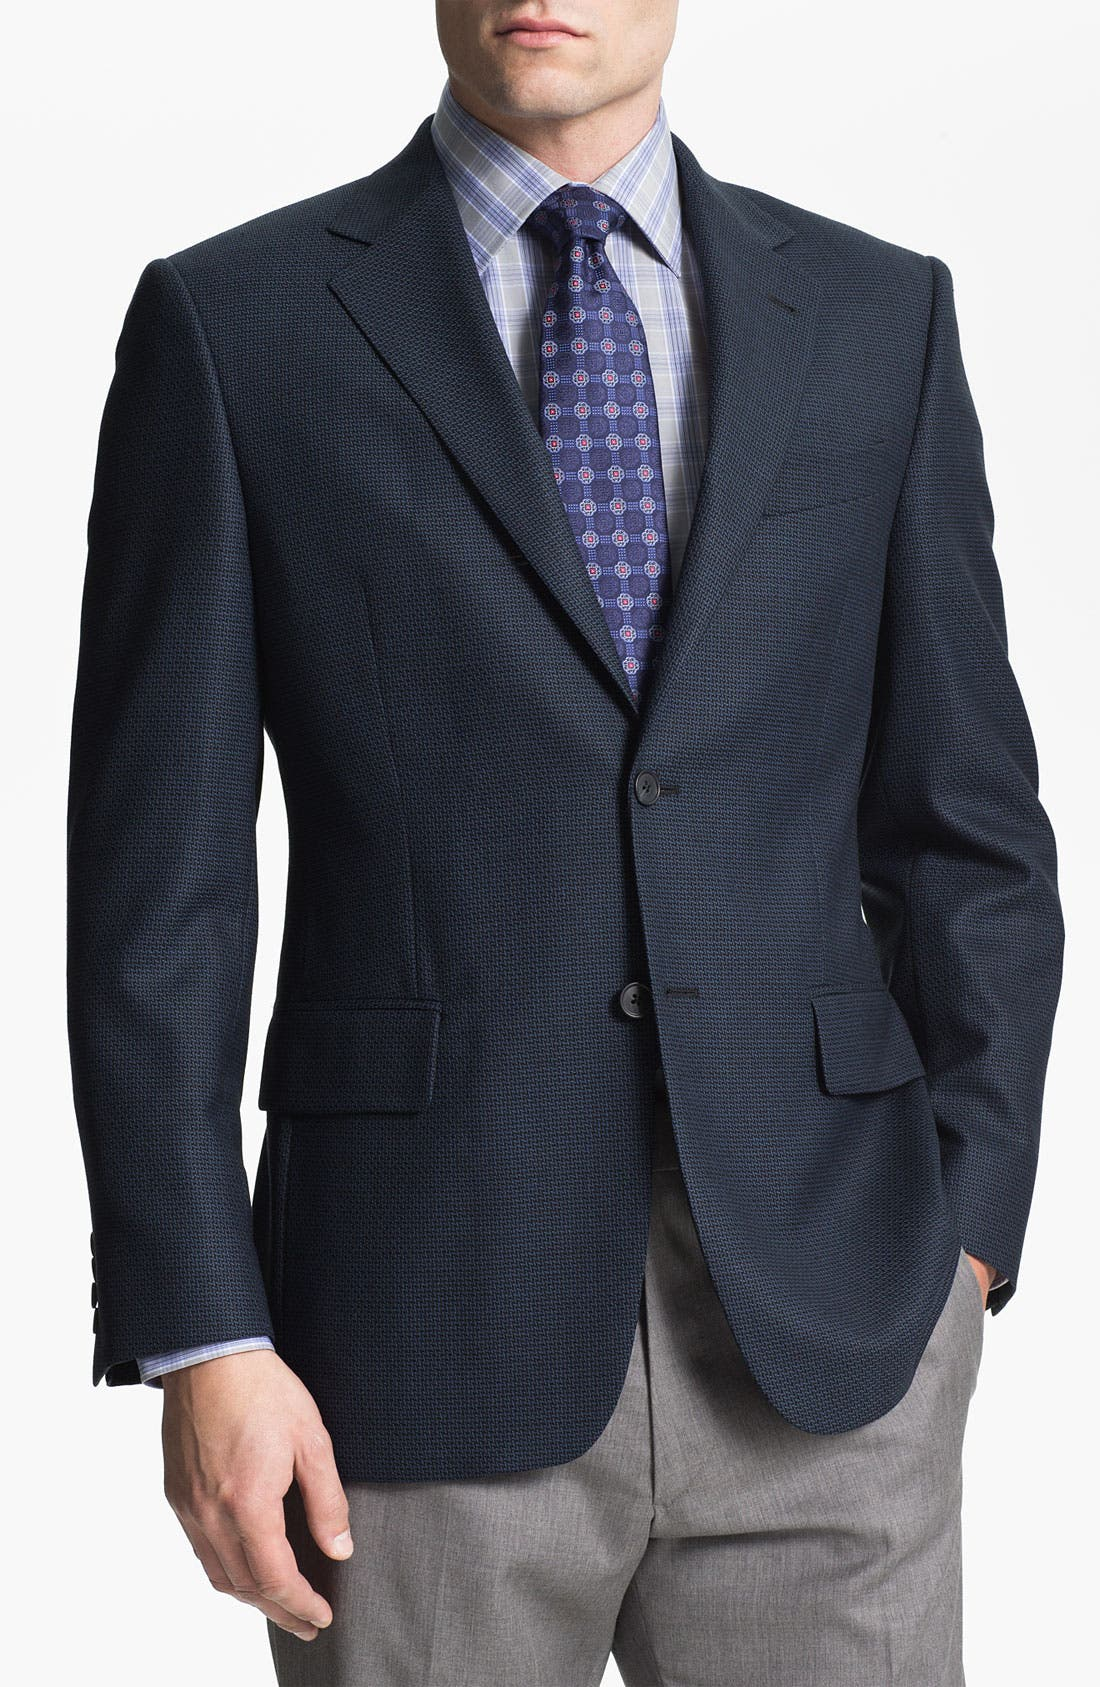 Main Image - Joseph Abboud 'Signature Silver' Wool Sportcoat